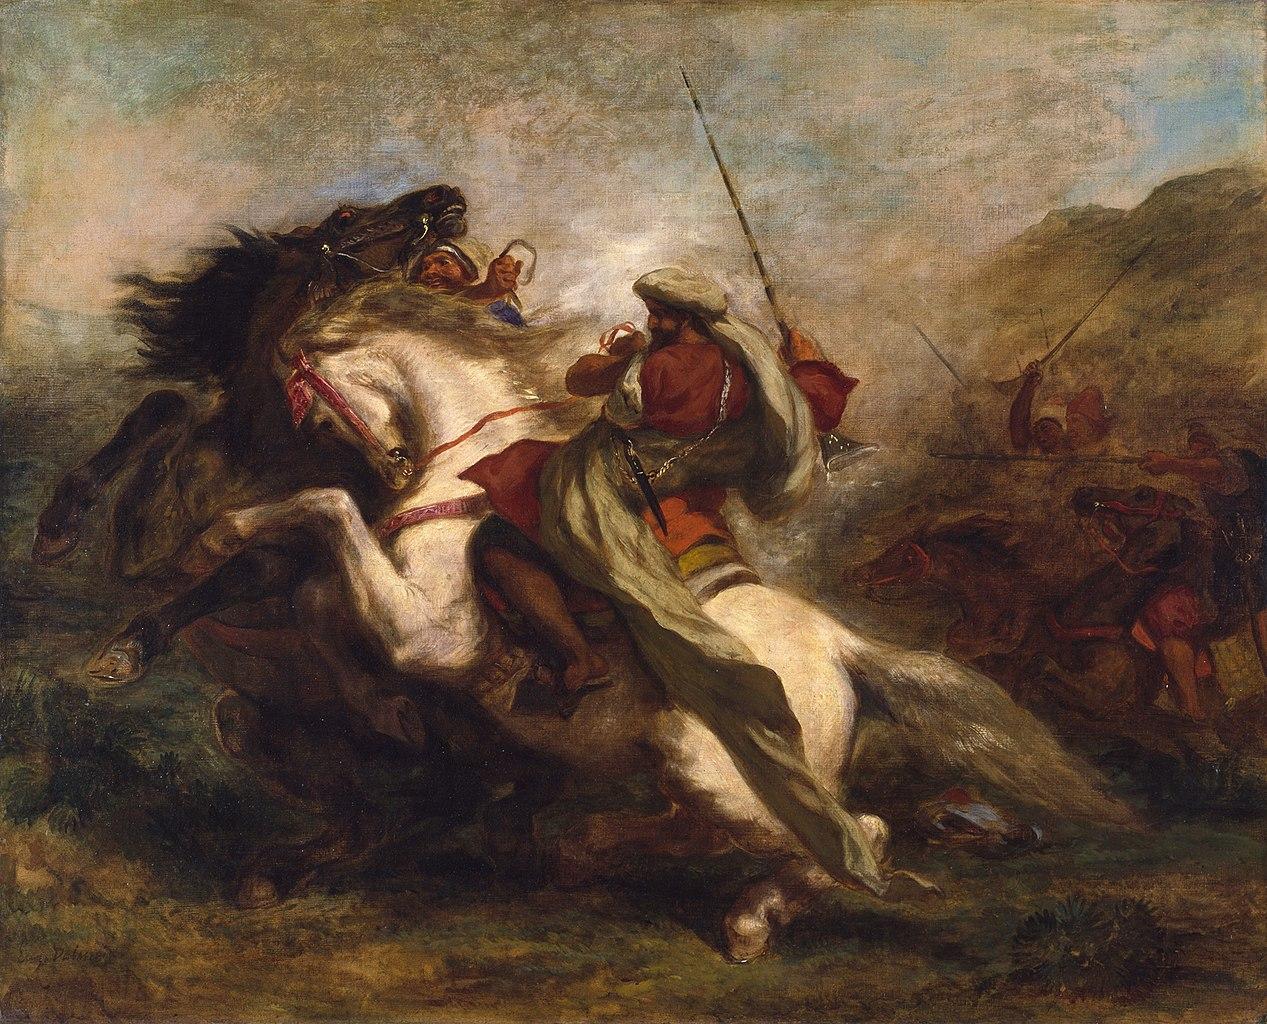 Collision of Moorish Horsemen, 1843-4, Delacroix Eugène, France